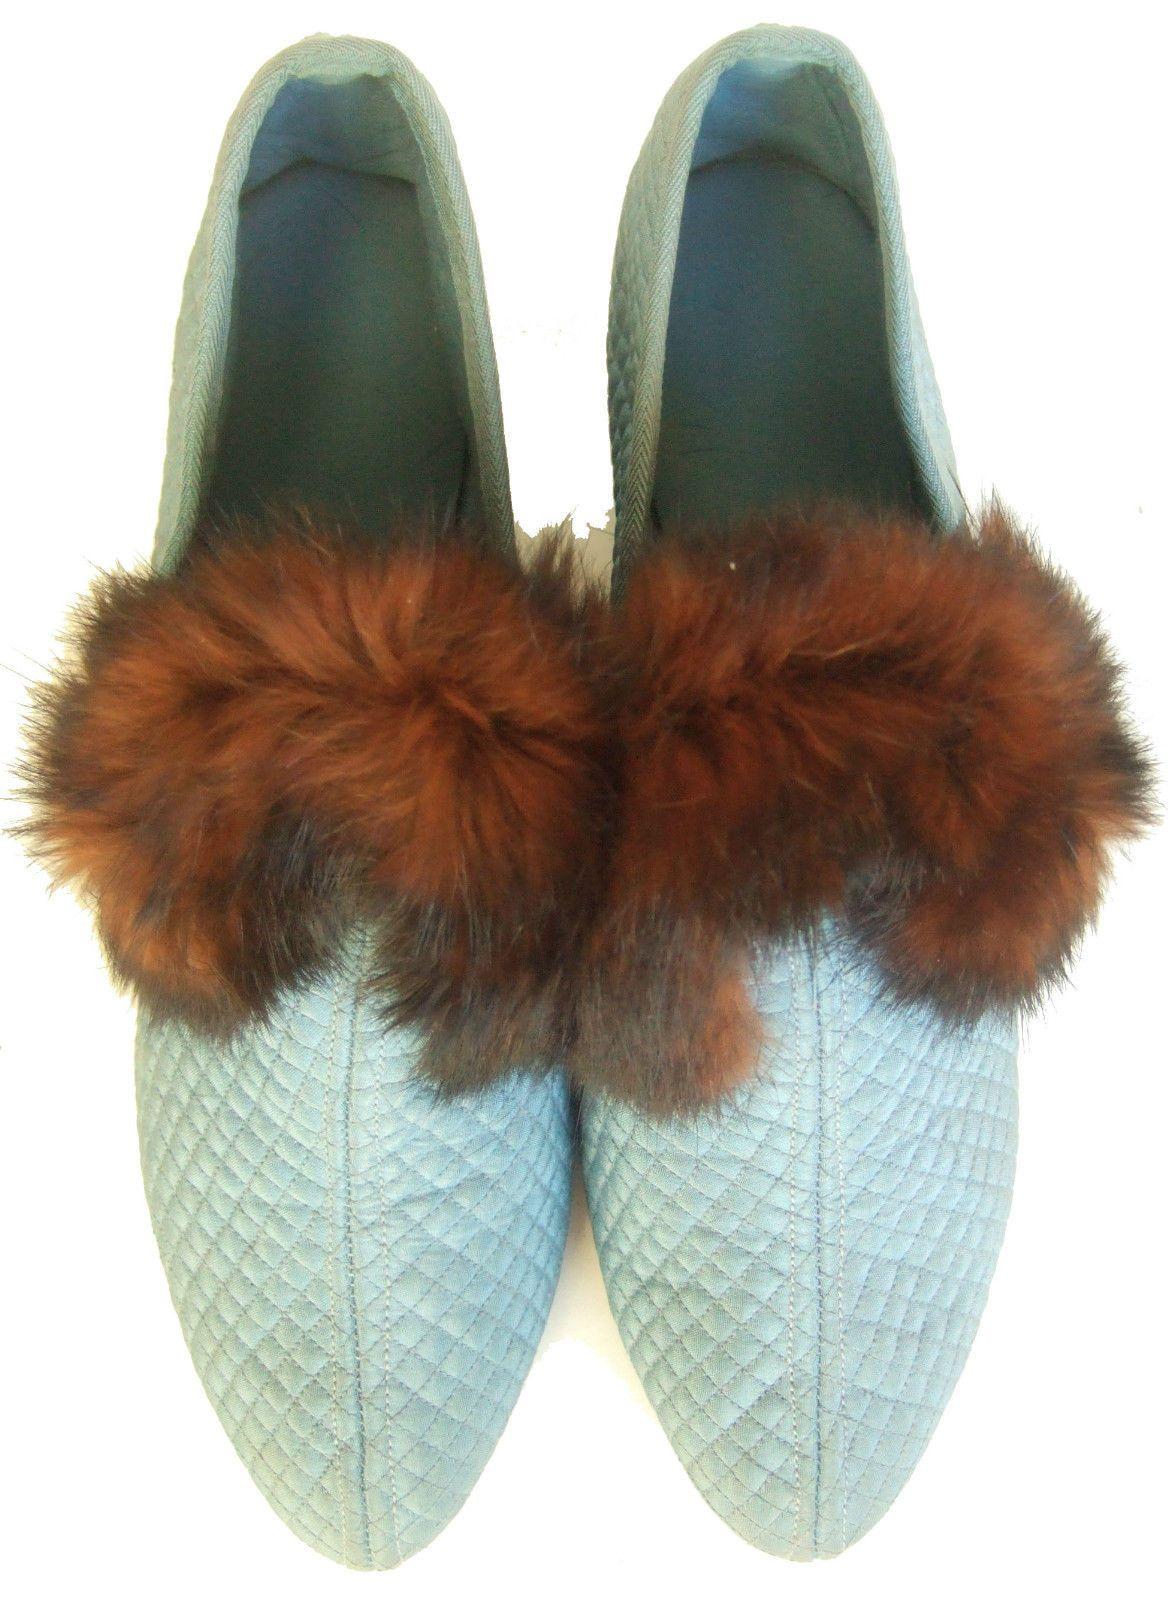 4daffb59fe1 Antique Vintage 20s 30s blue quilted silk slippers louis heels fur ...